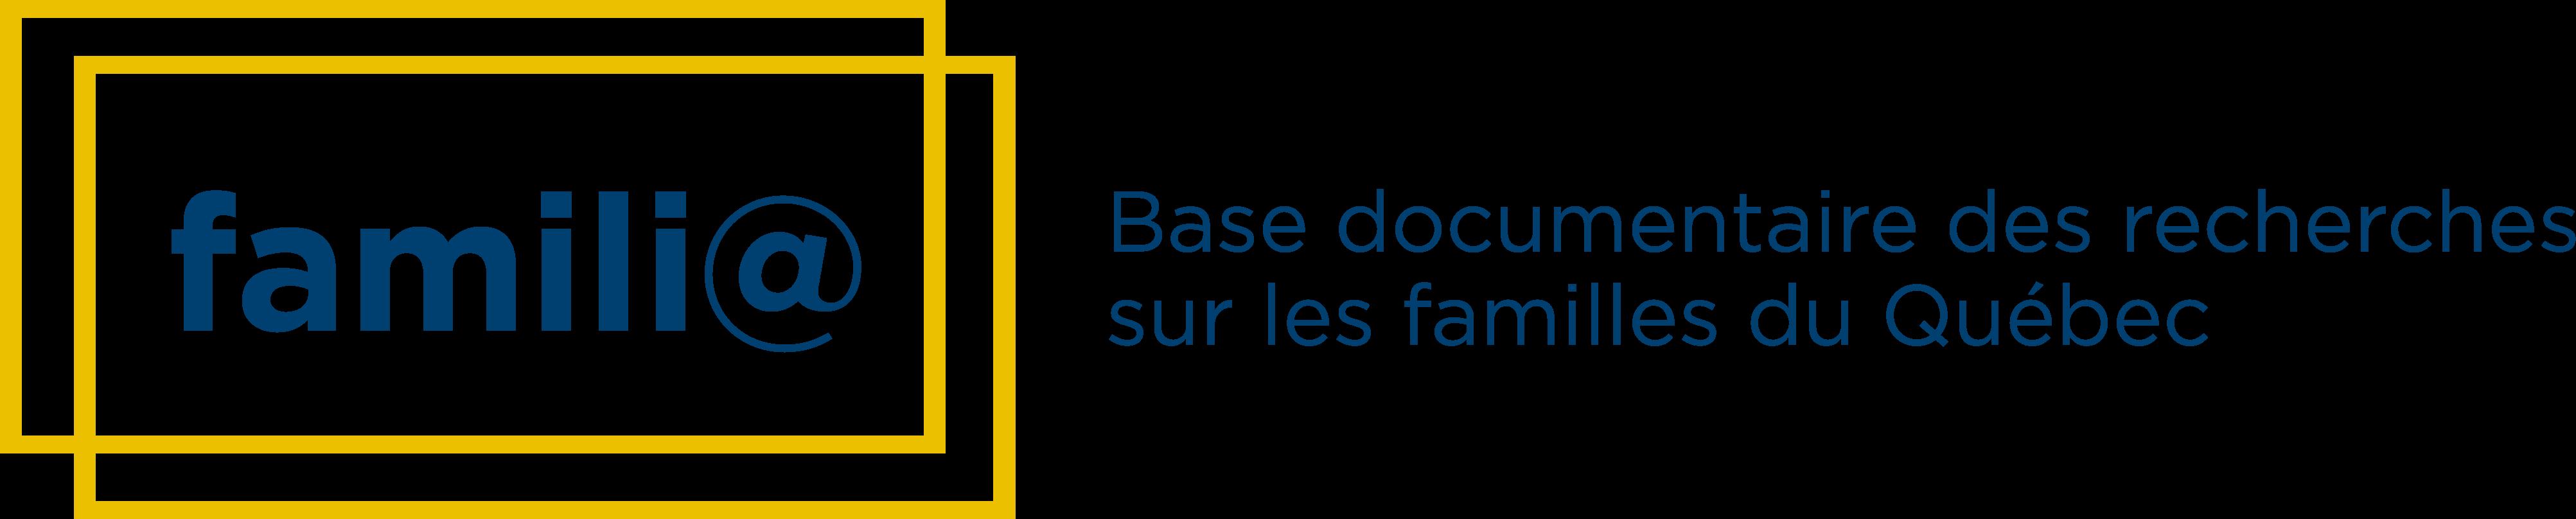 Logo Famili@